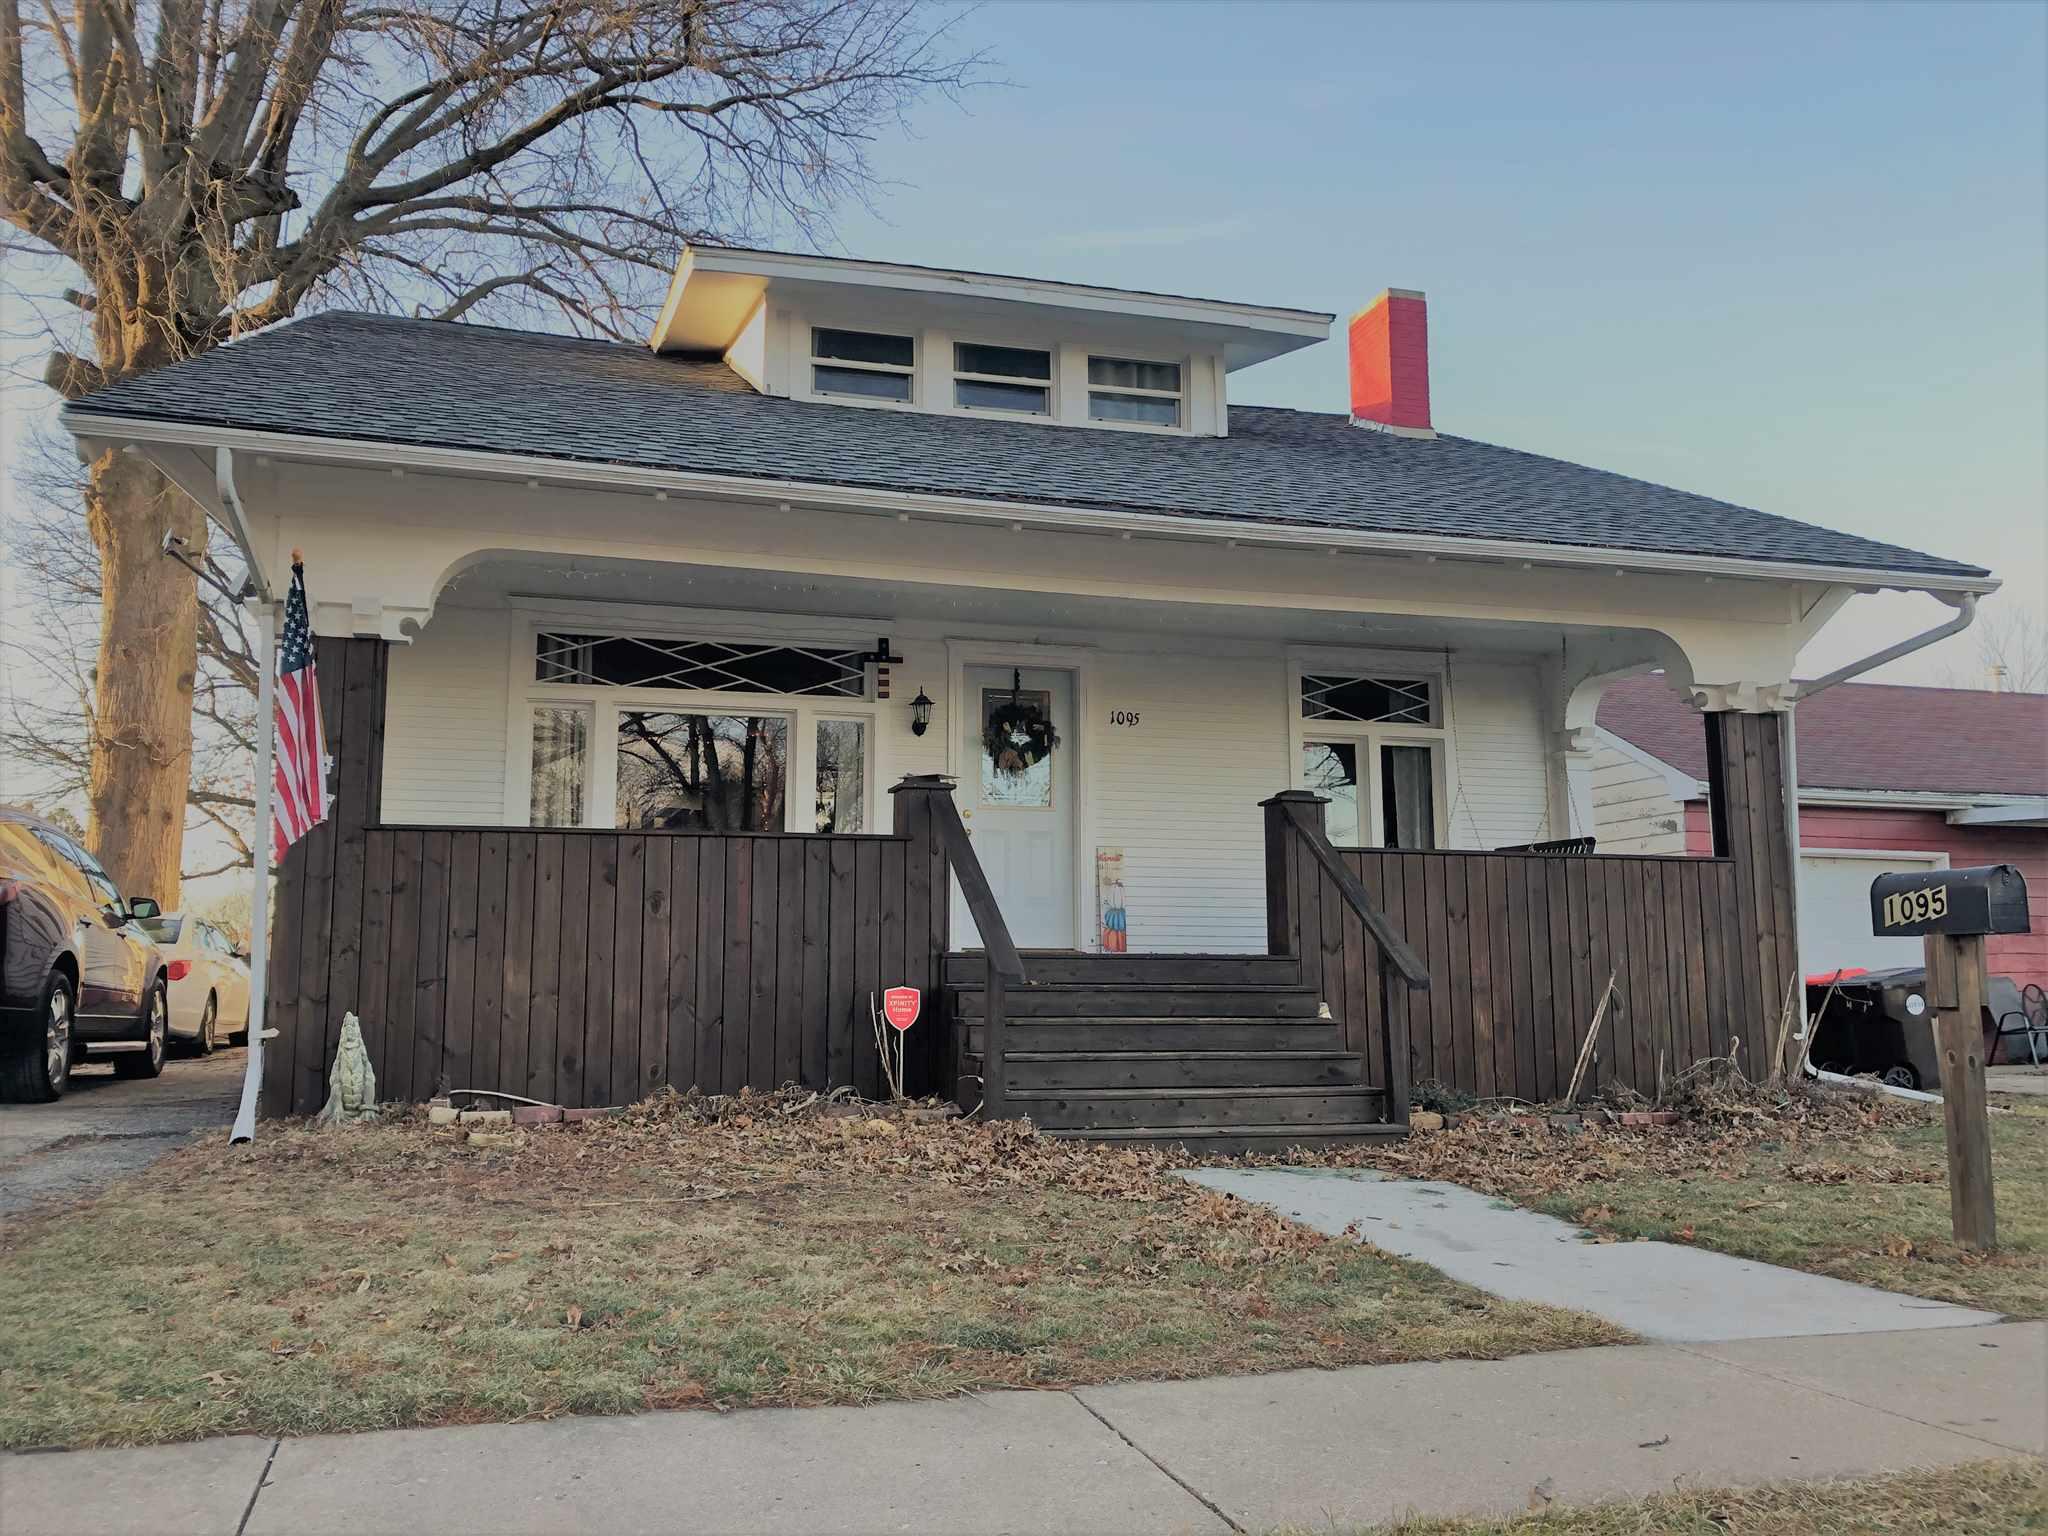 1095 N CRAFFORD Property Photo - Bushnell, IL real estate listing